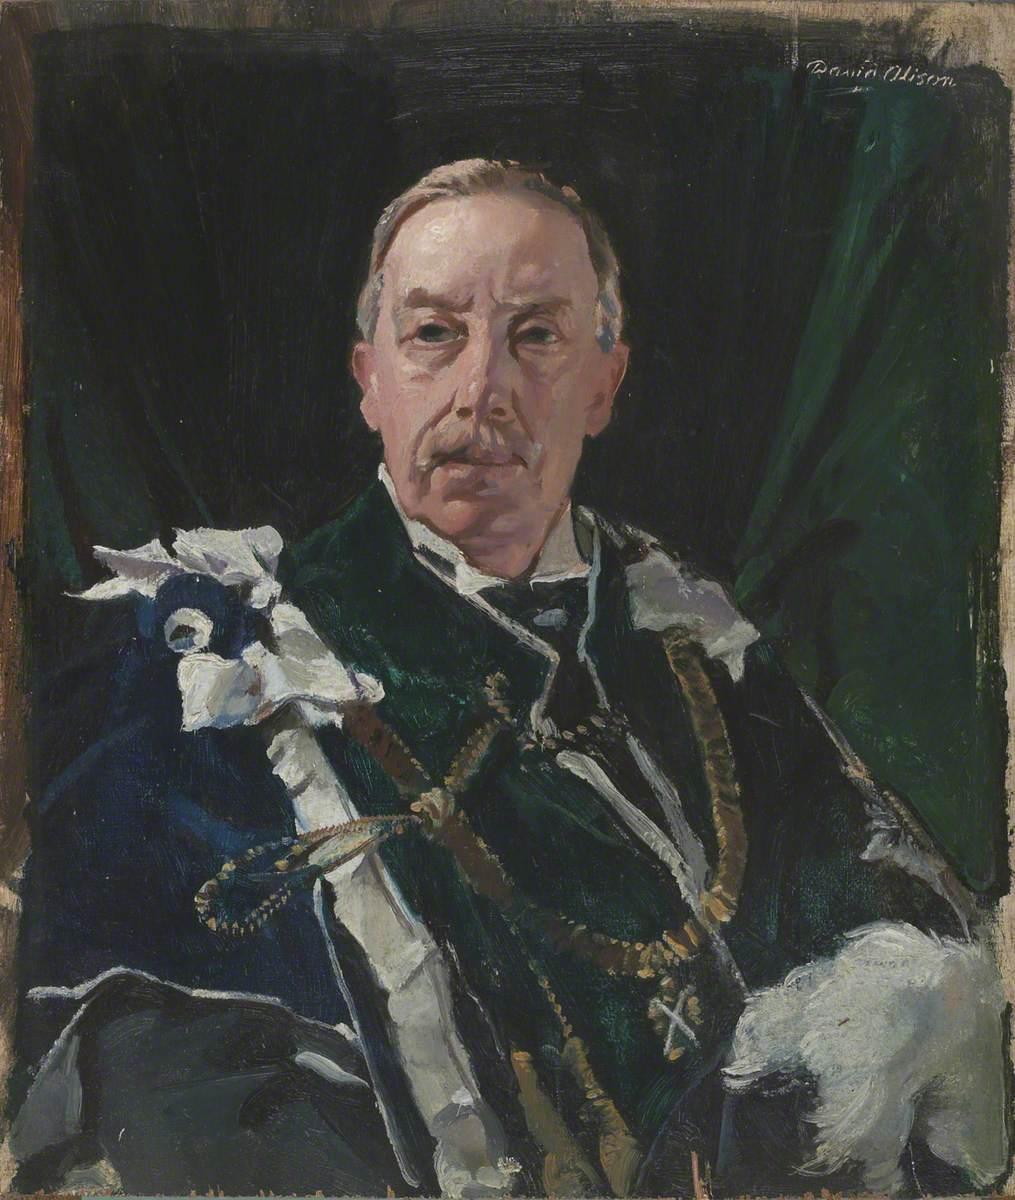 Walter John Francis Erskine (1865–1955), 12th Earl of Mar and 14th Earl of Kellie